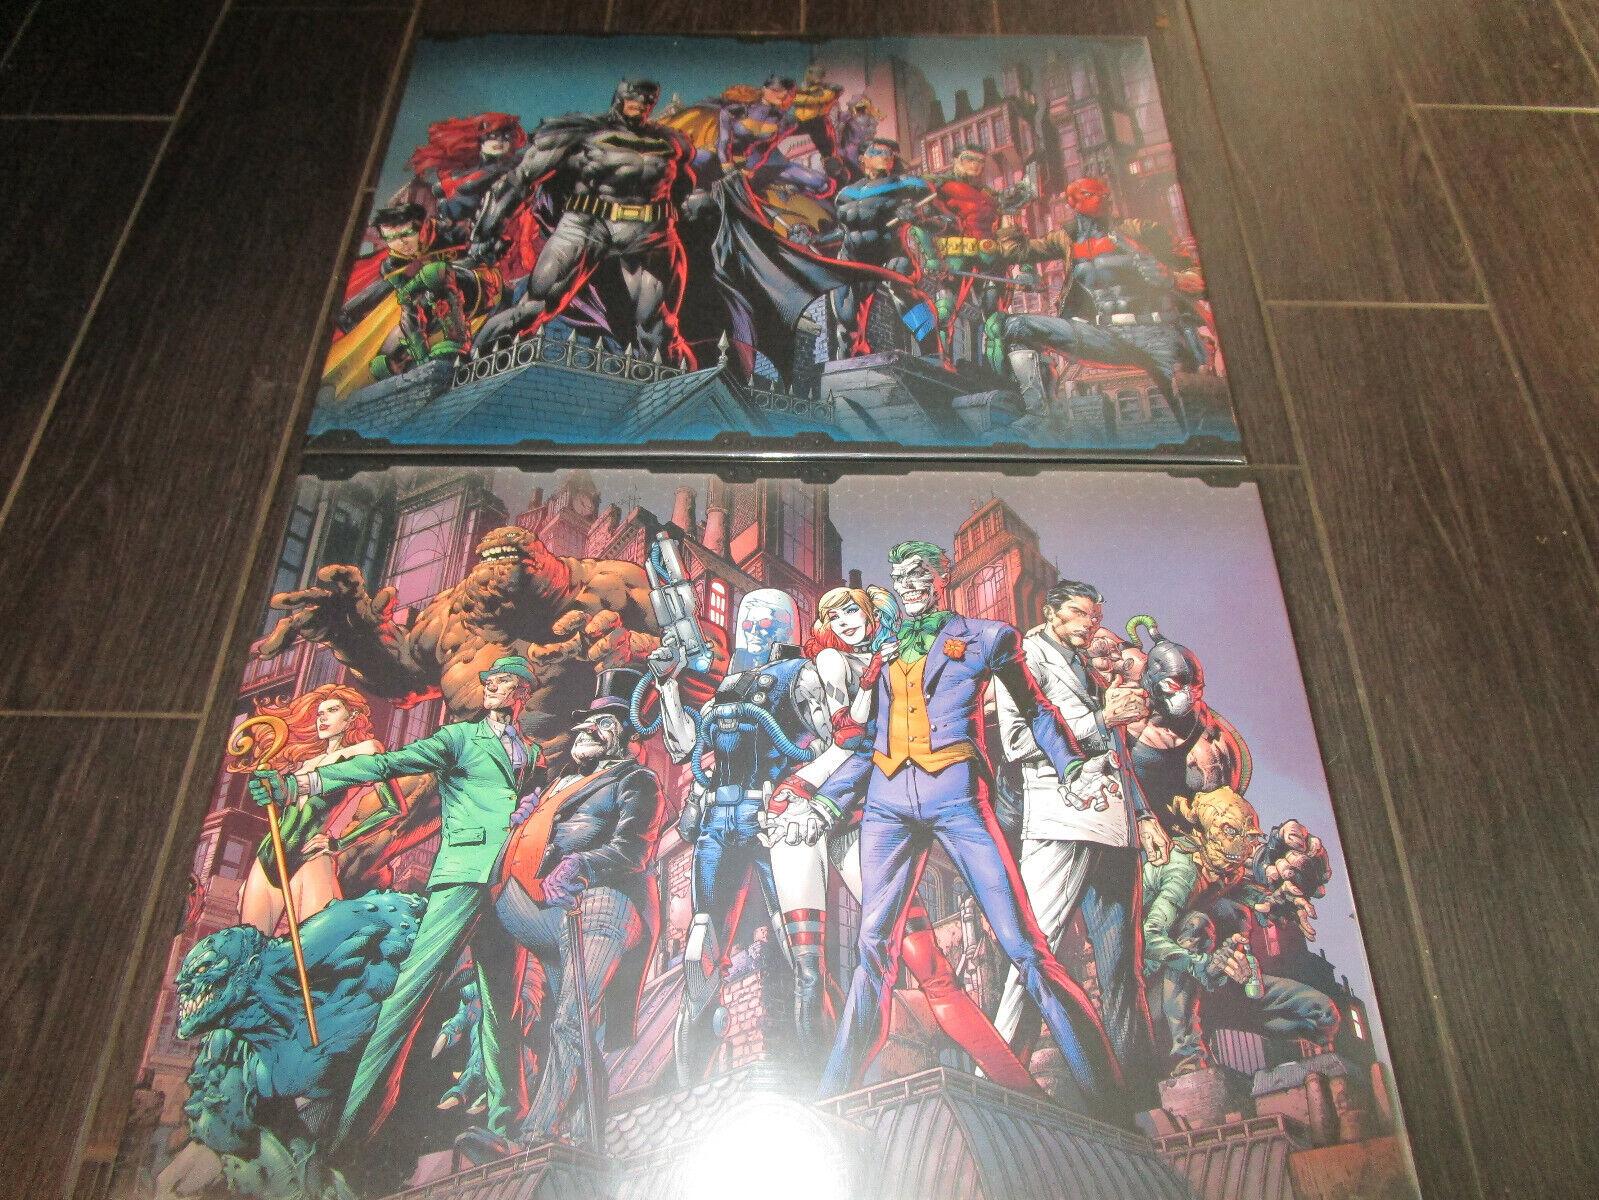 Nuevo Batman Gotham City Chronicles Juego De Mesa KickEstrellater exclusivo promesa Ks